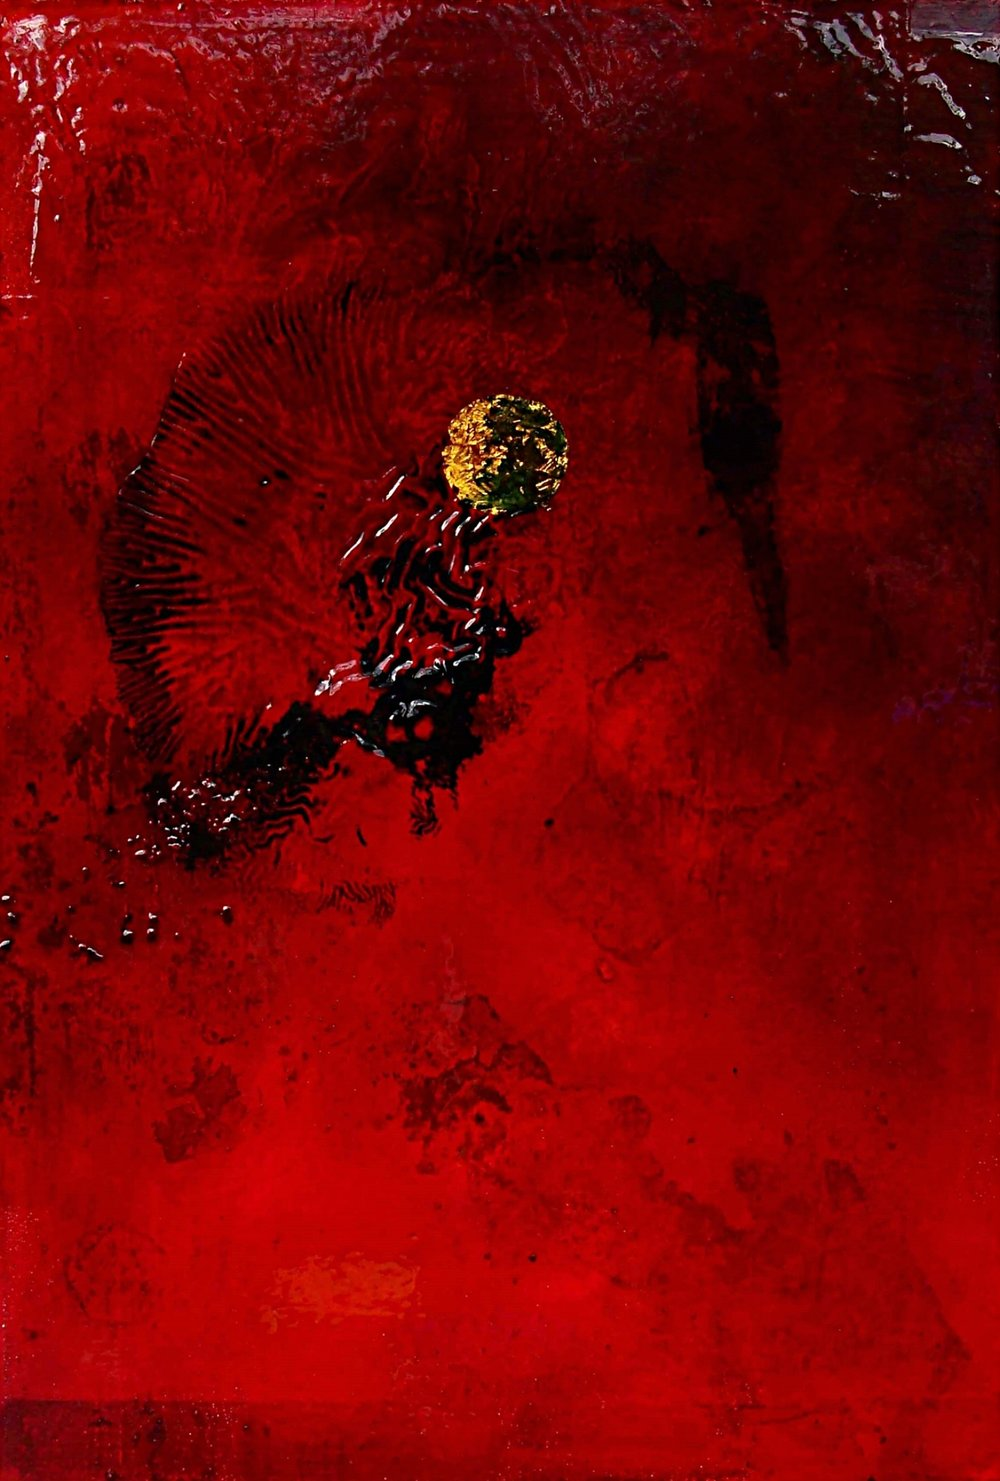 Corporeal 4 oil on canvas 60x90cm 2013-14